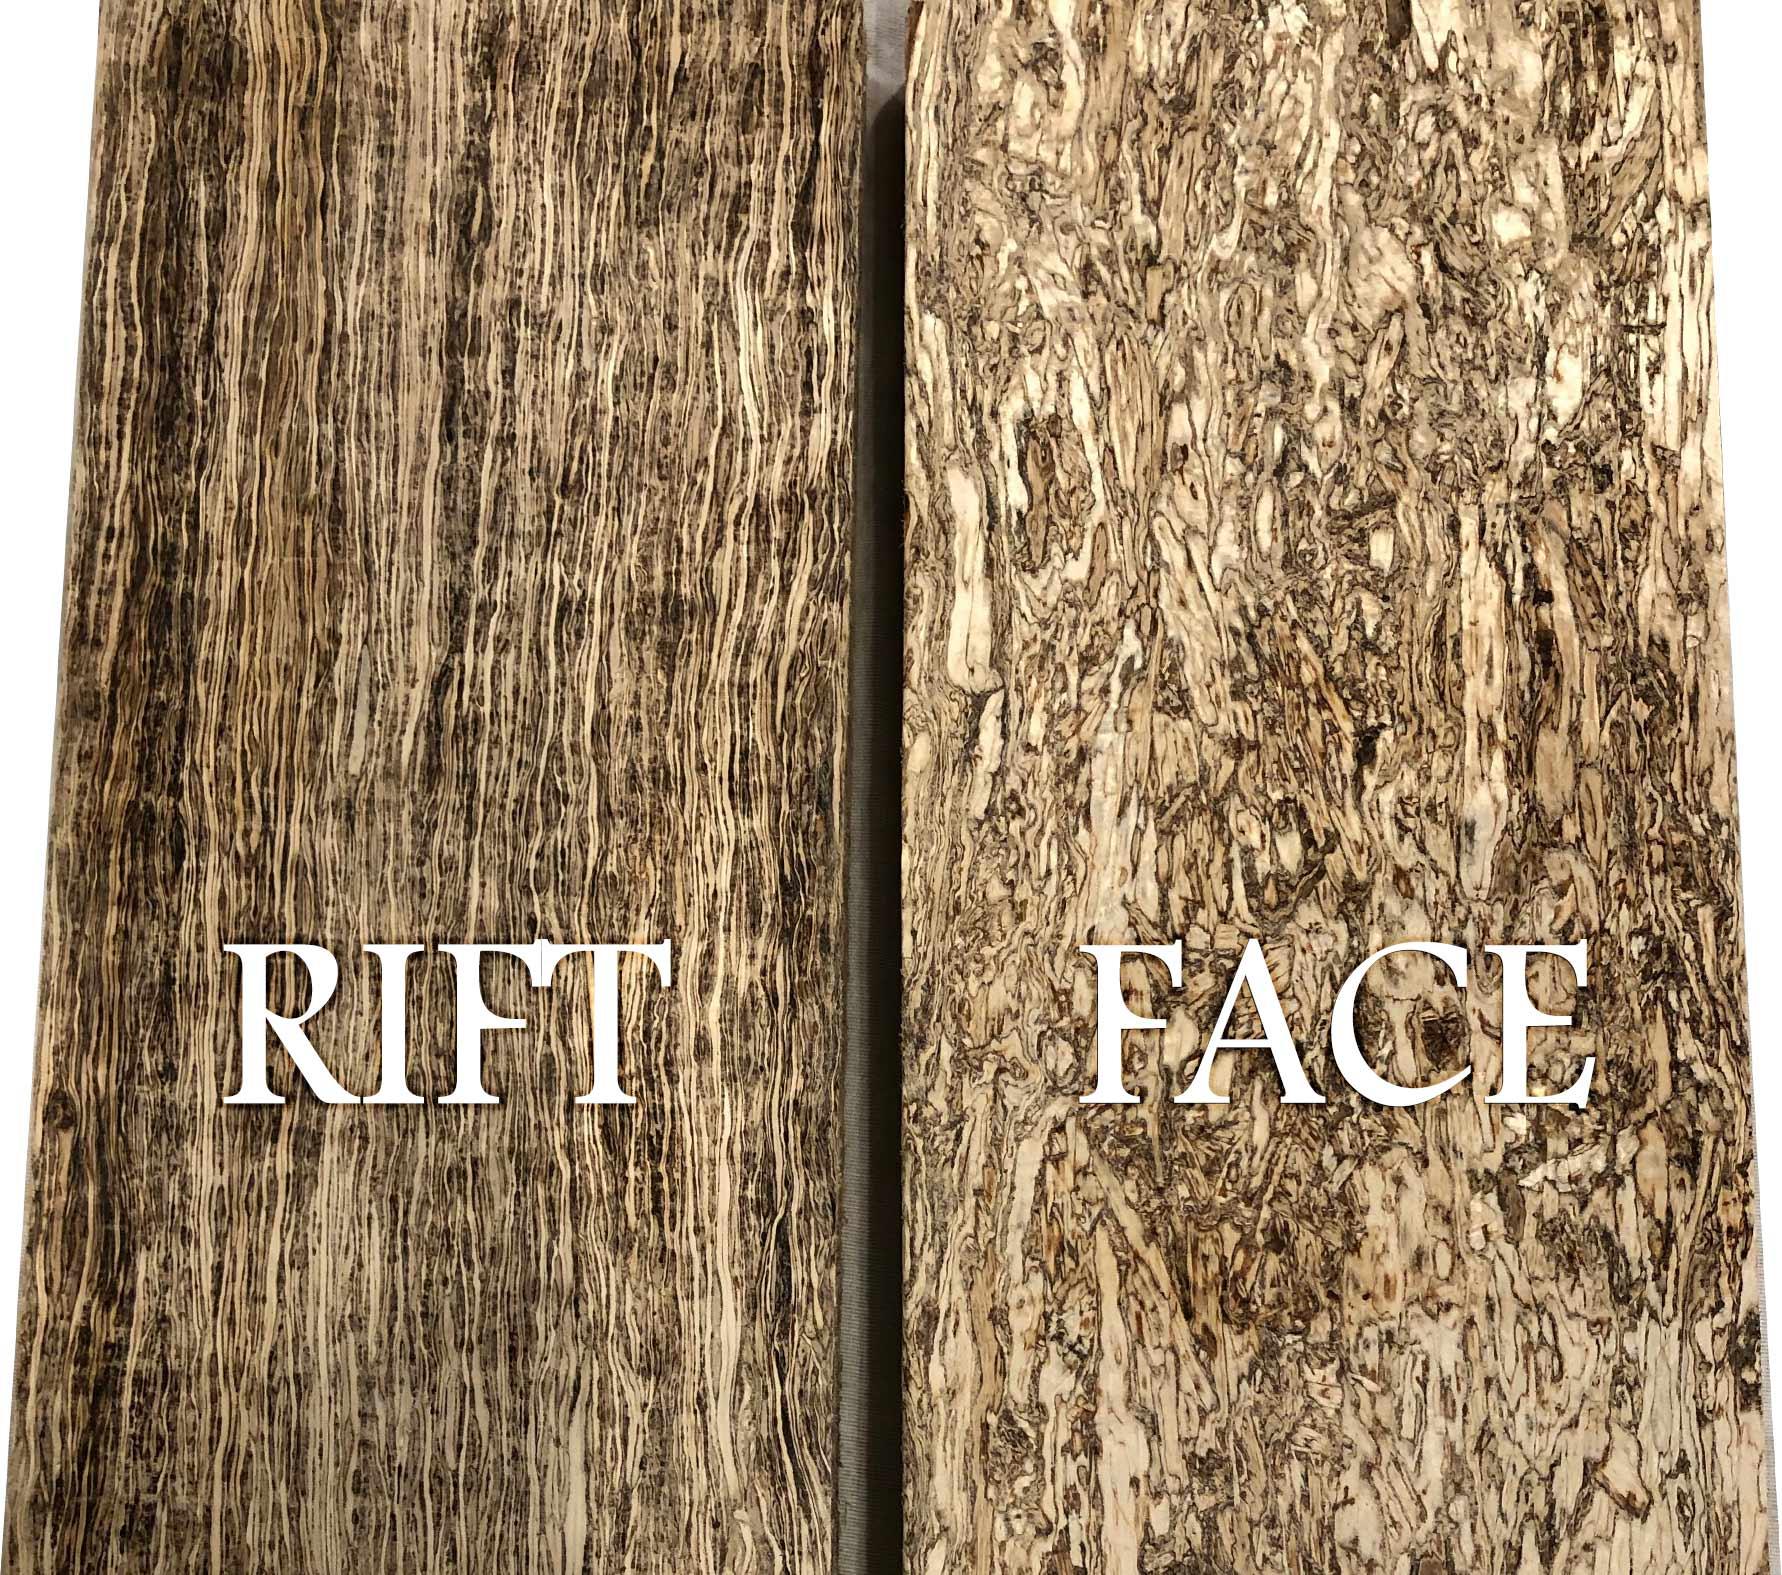 Rift vs. Face Sawn